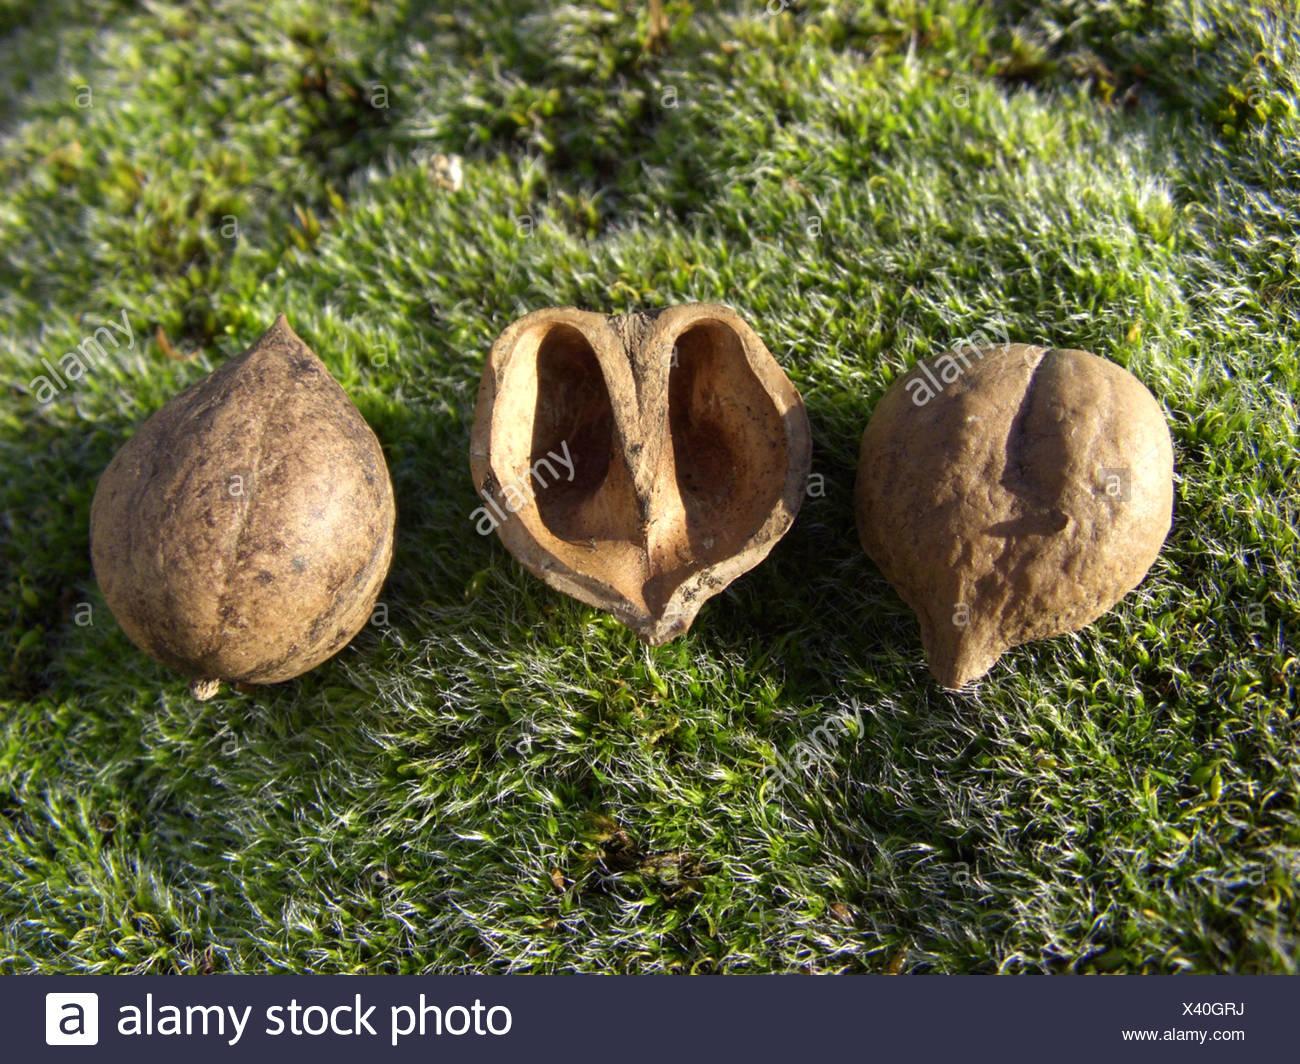 bitter-nut hickory, bitternut hockory (Carya cordiformis), fruits Stock Photo